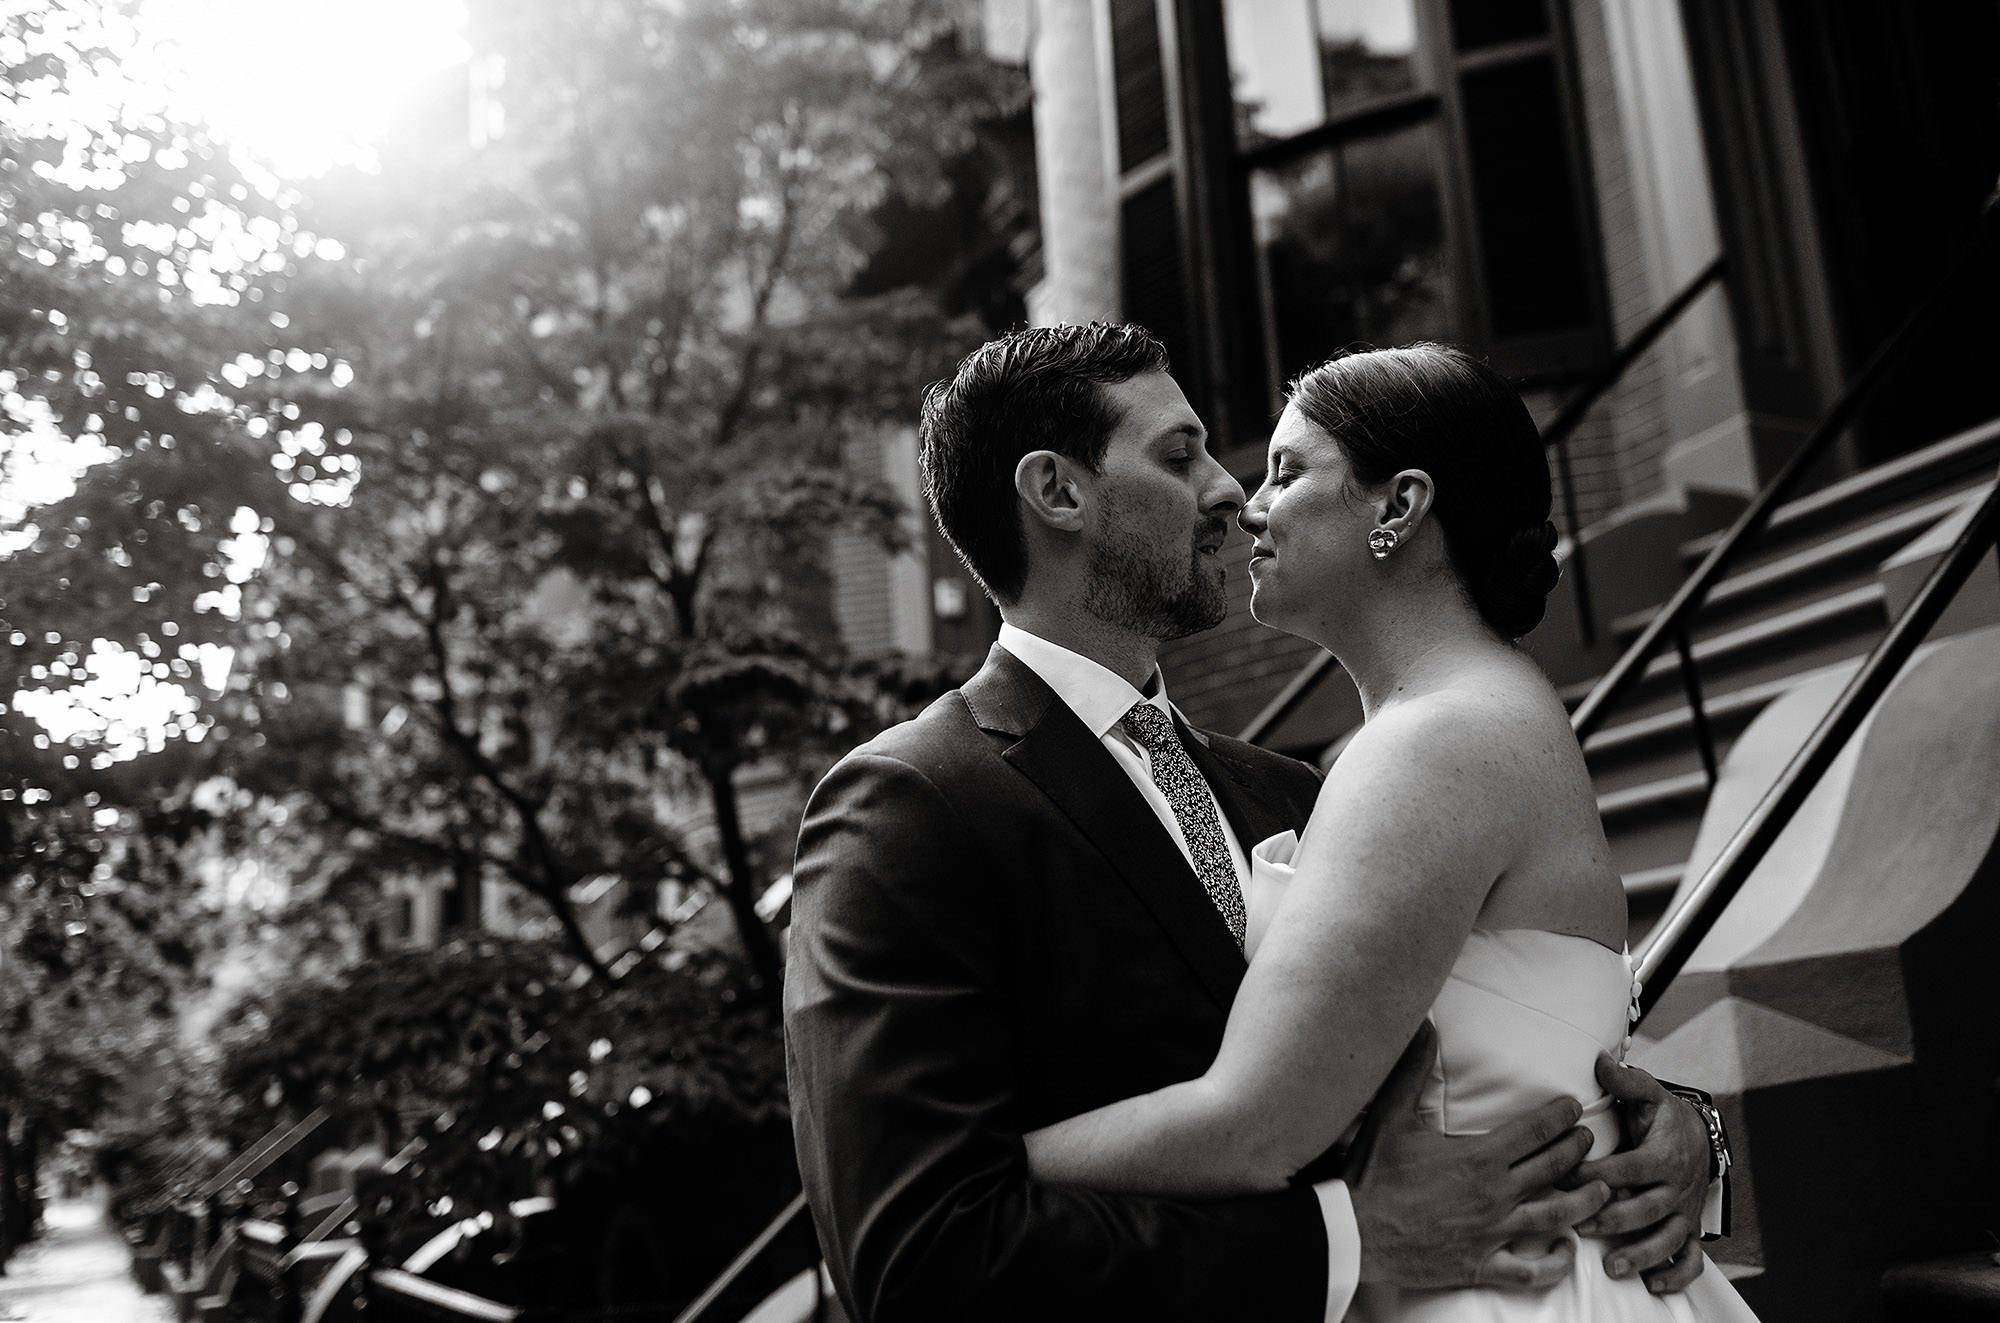 SRV Boston Wedding  I  The couple kiss before their wedding in Boston, MA.